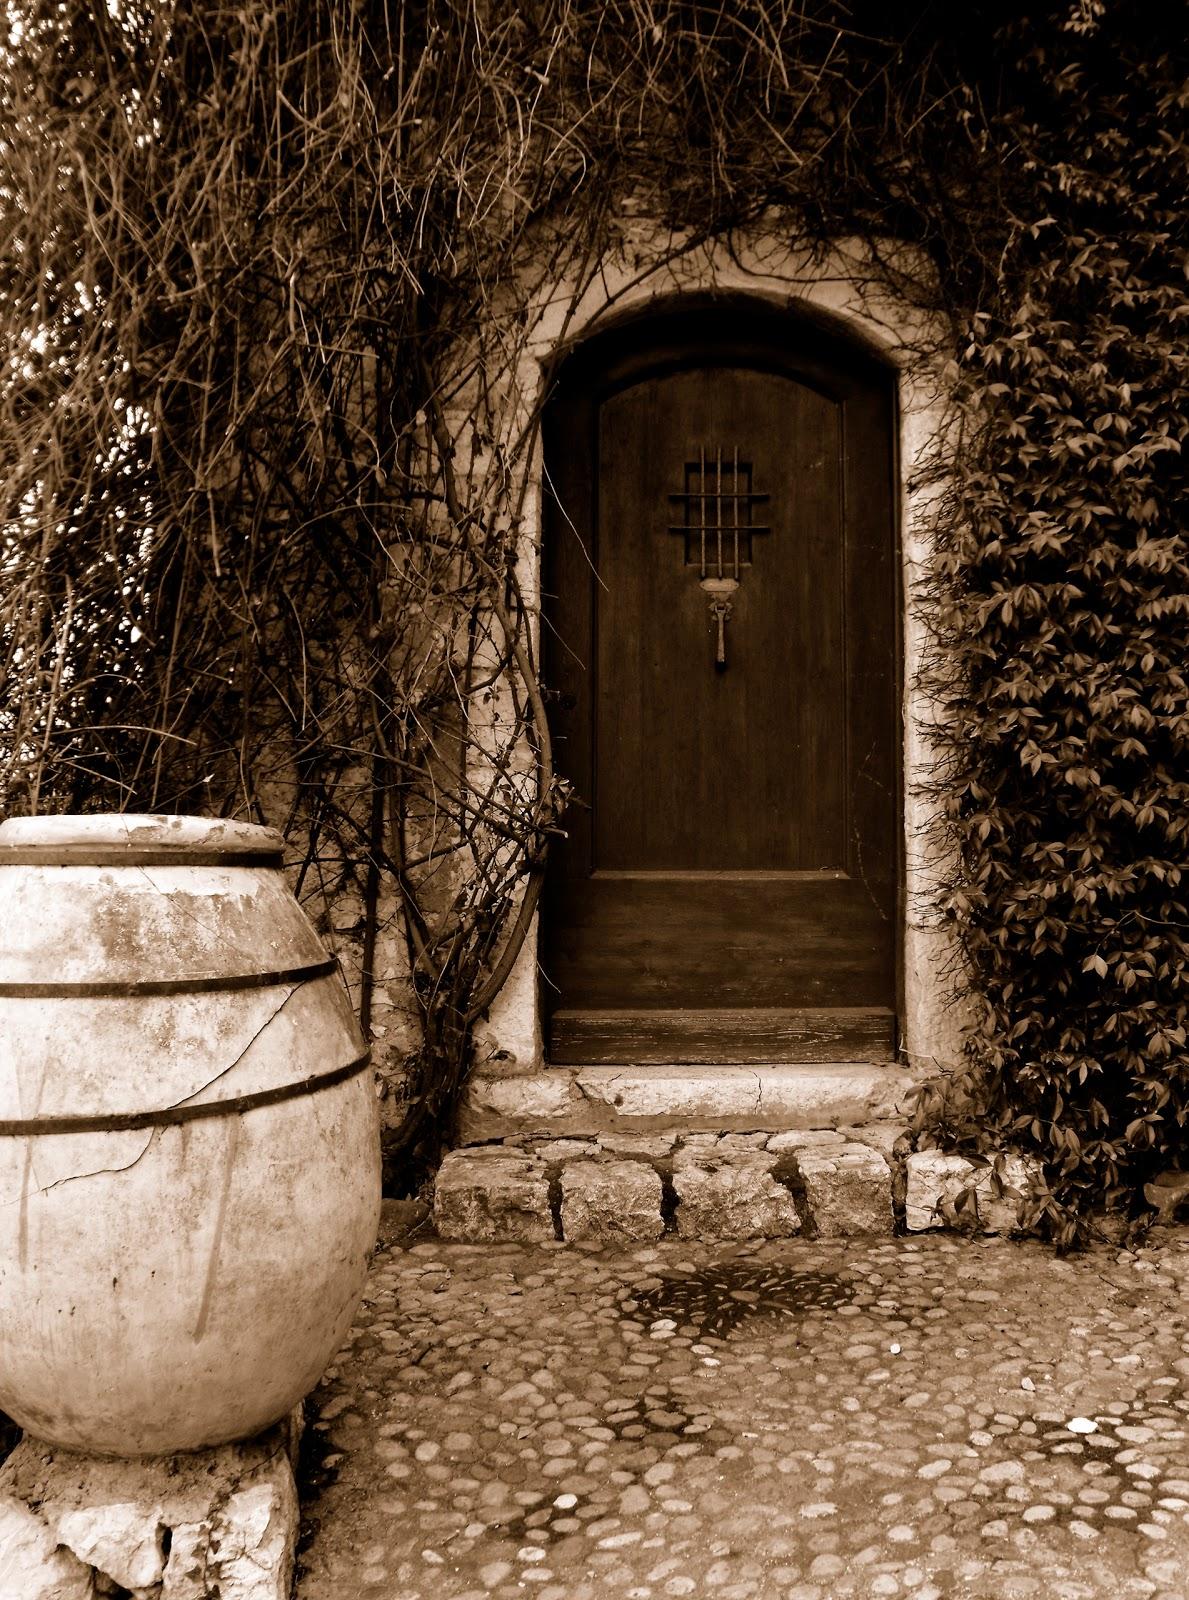 1600 #23150A  Girl In France: Beautiful Saint Paul De Vence Medieval French Doors wallpaper Beautiful French Doors 32451189